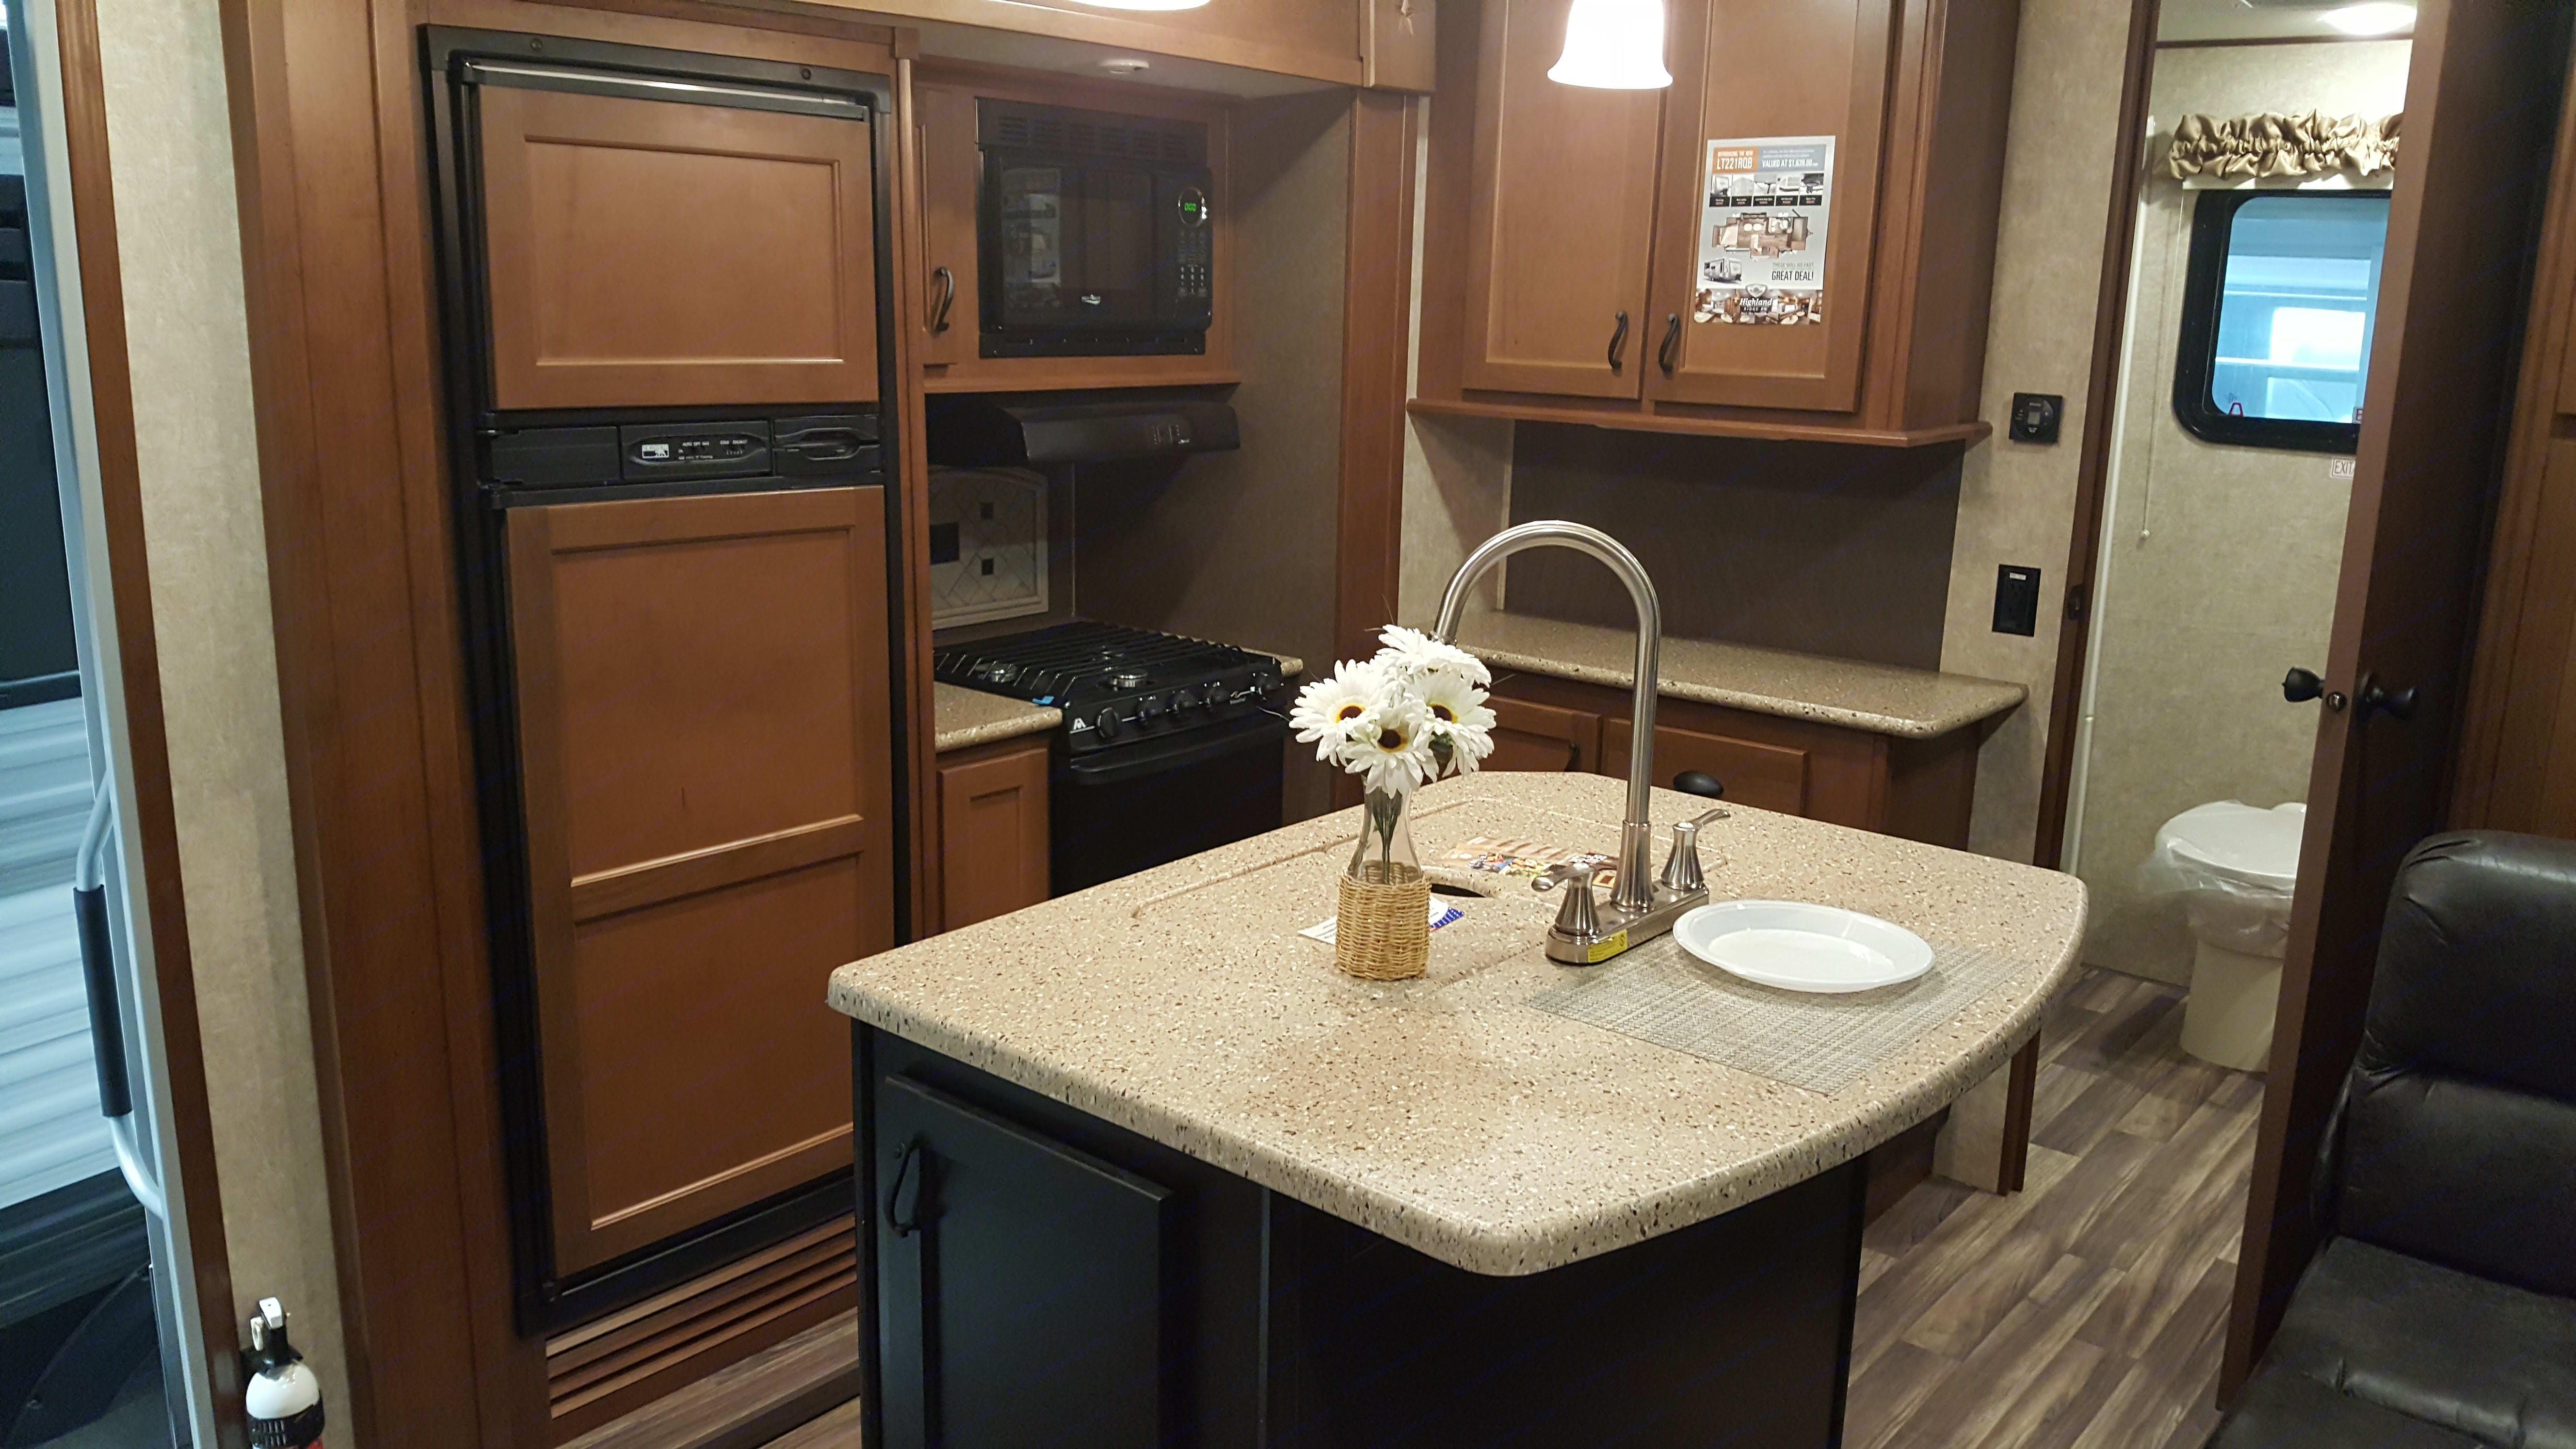 Full kitchen with large fridge/freezer, stove, oven island with lots of storage.. Open Range Light 2017